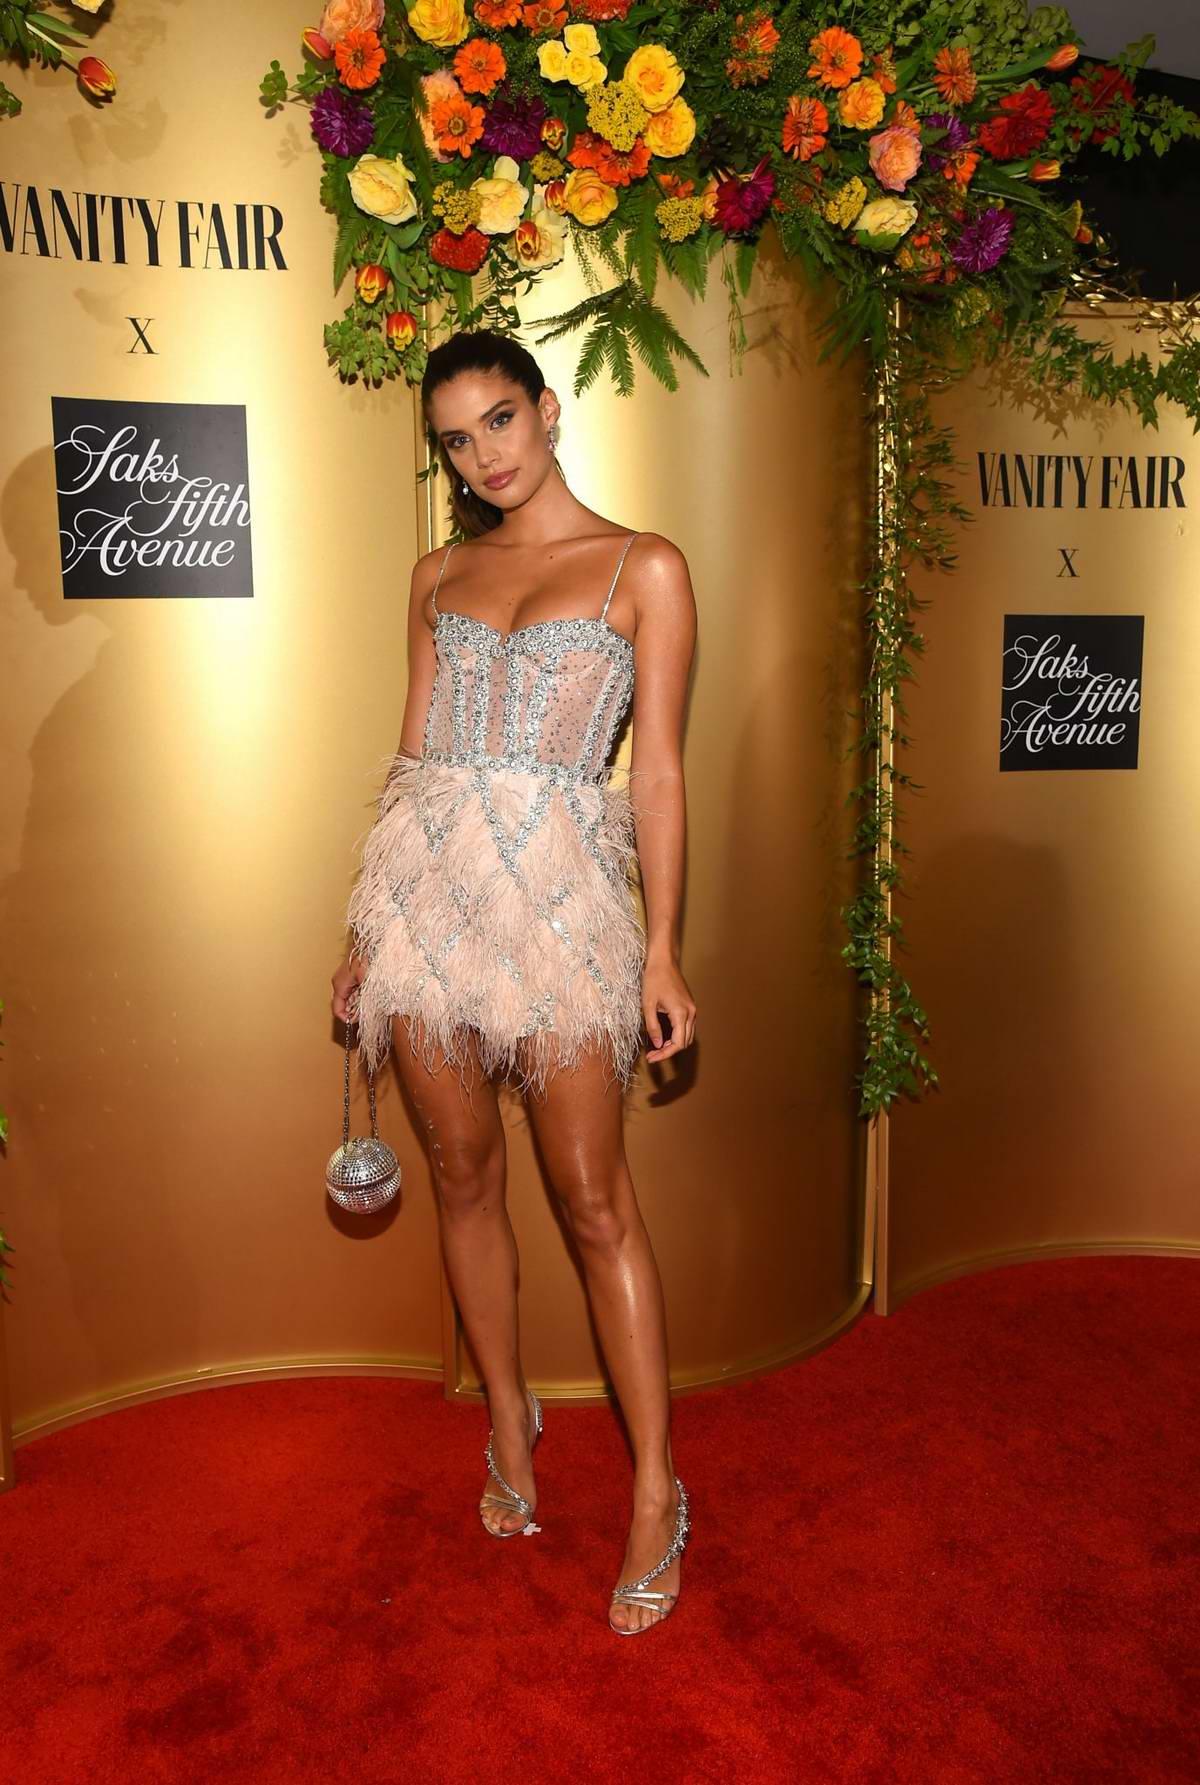 Sara Sampaio attends Vanity Fair and Saks Fifth Avenue celebrate Vanity Fair's Best-Dressed 2018 at Manhatta in New York City